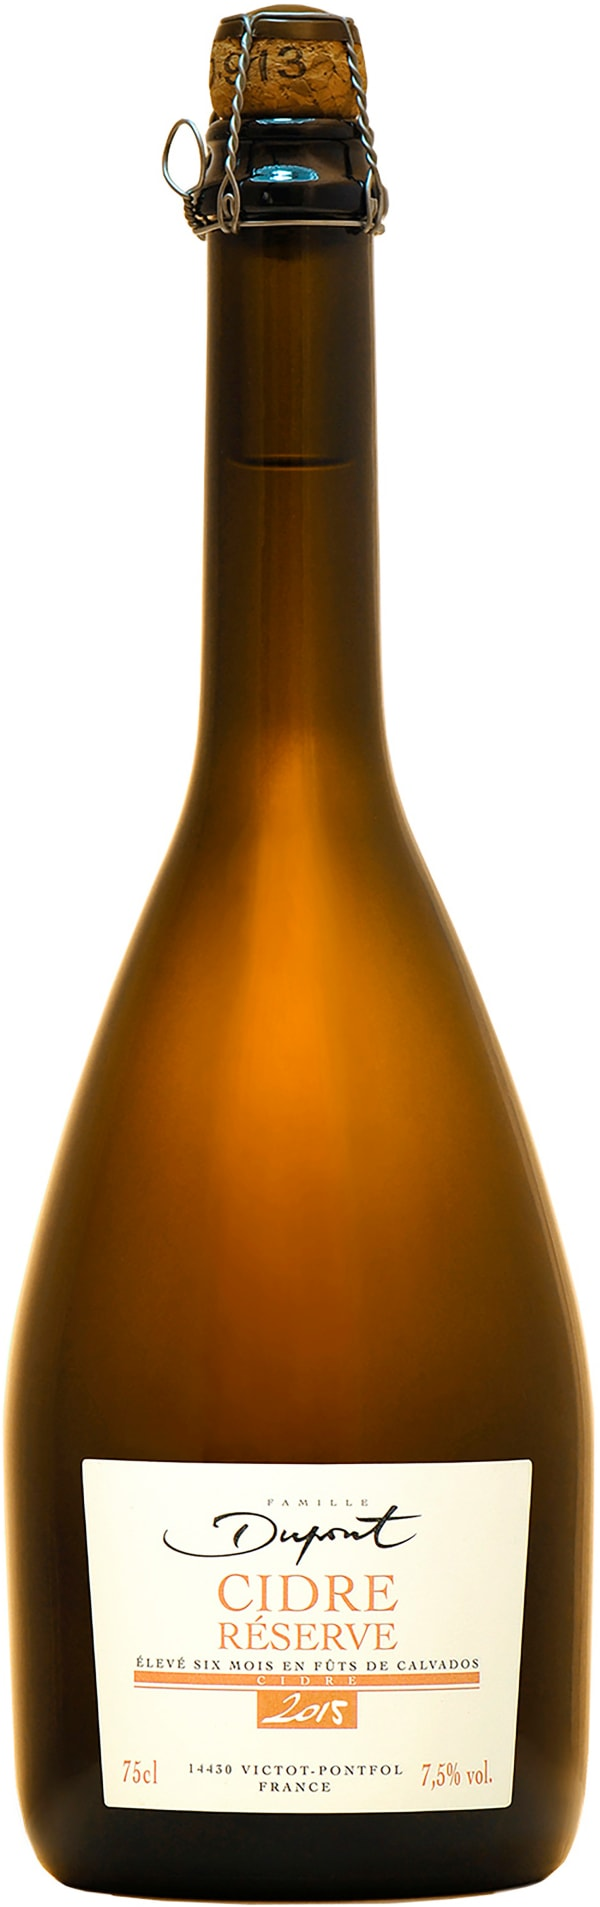 Dupont Cidre Reserve Calvados Cask 2017